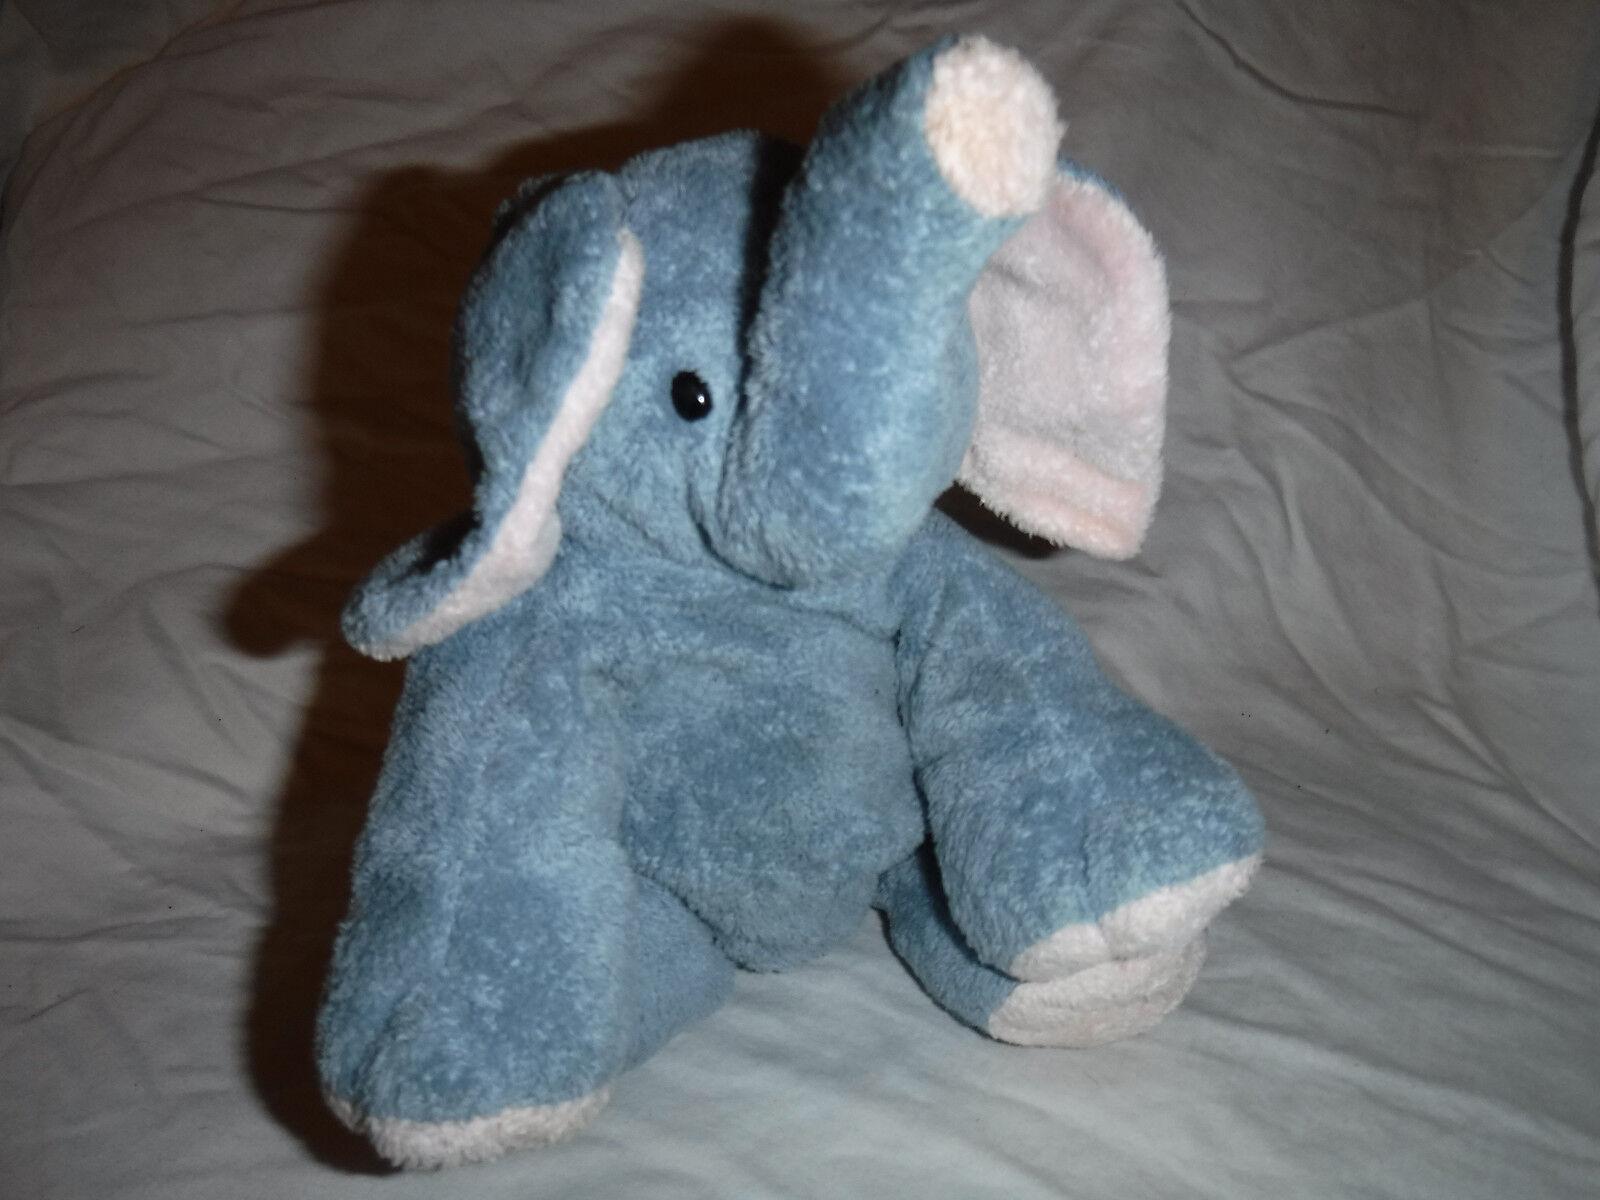 2002 Pluffies Elephant 12  Plush Soft Toy Stuffed Animal